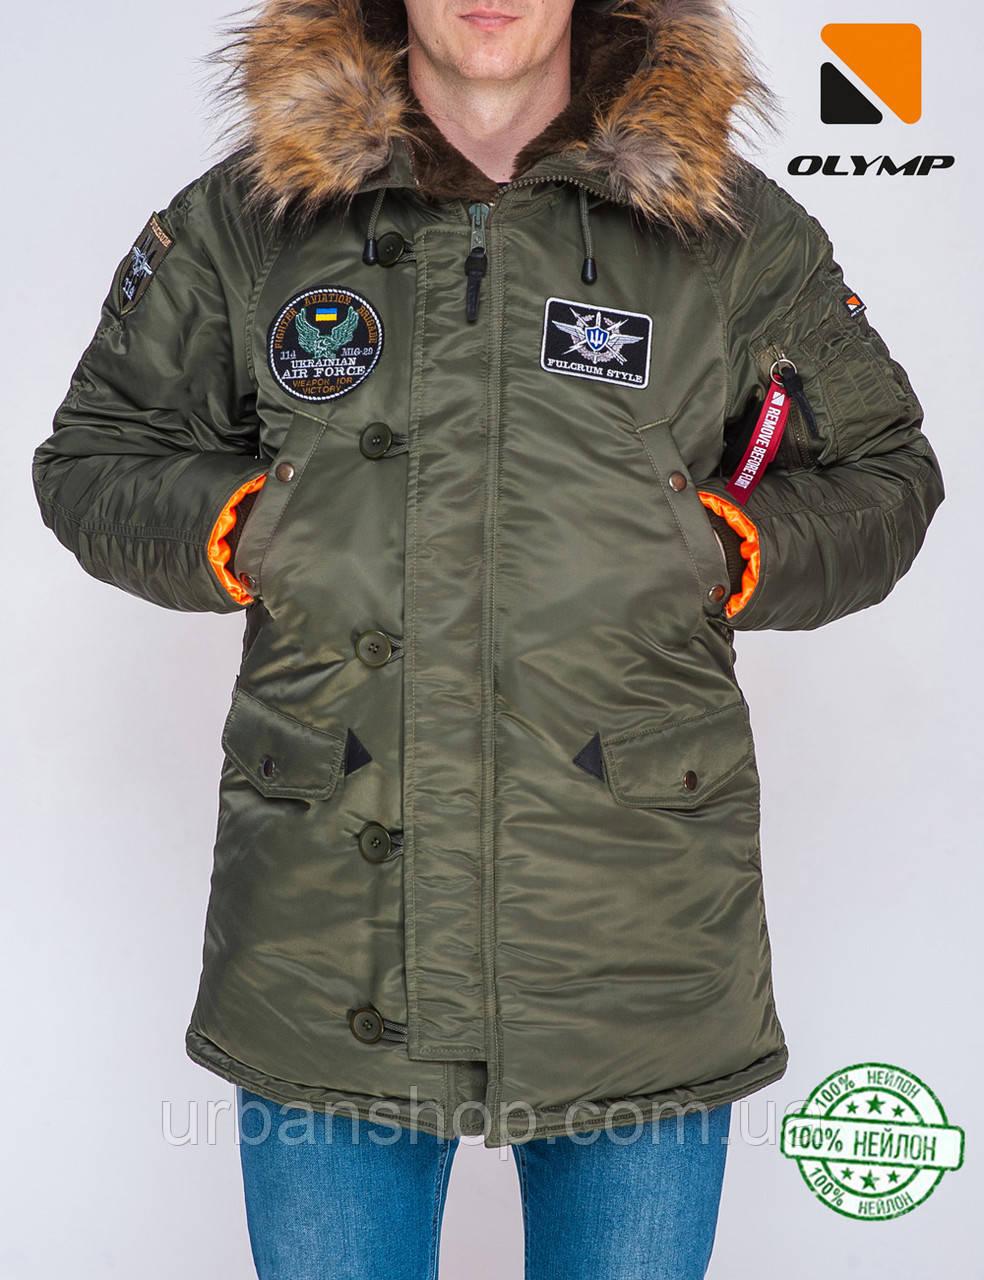 Парка Olymp з нашивками — Аляска N-3B, Slim Fit, Color: Khaki 100% Нейлон.